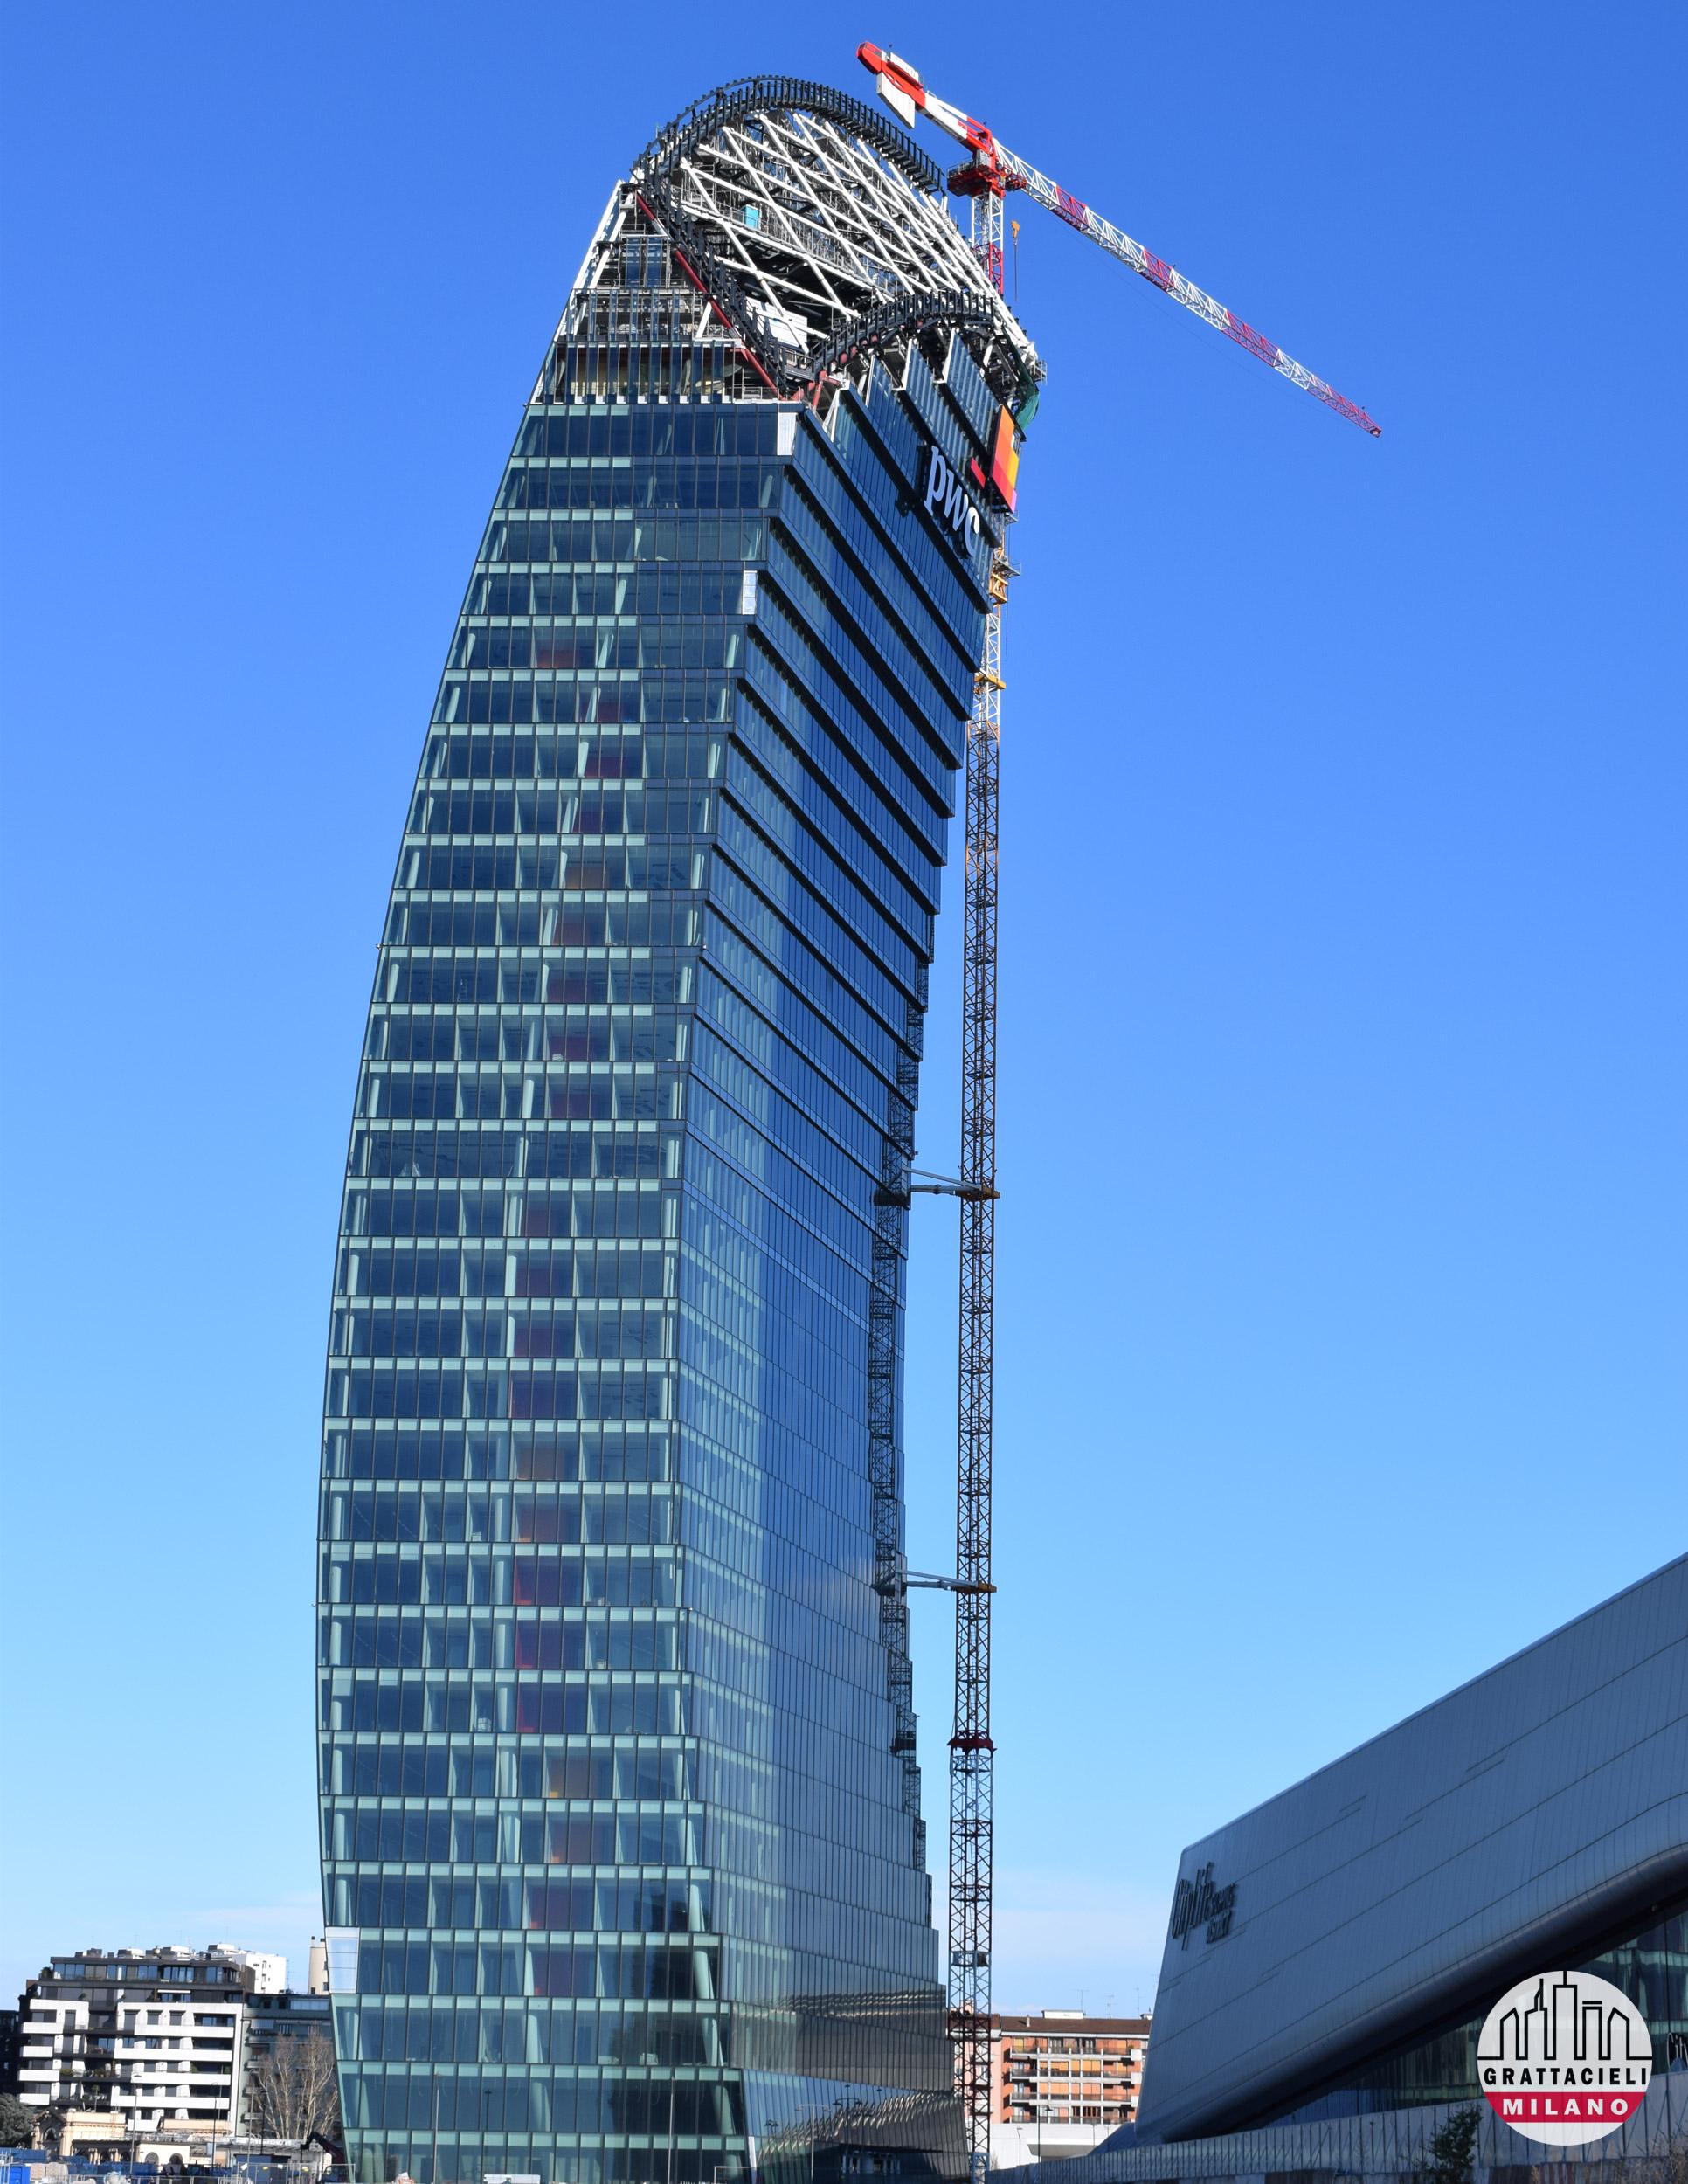 PwC Tower (Marzo 2020). Photo by Demetrio Rizzo